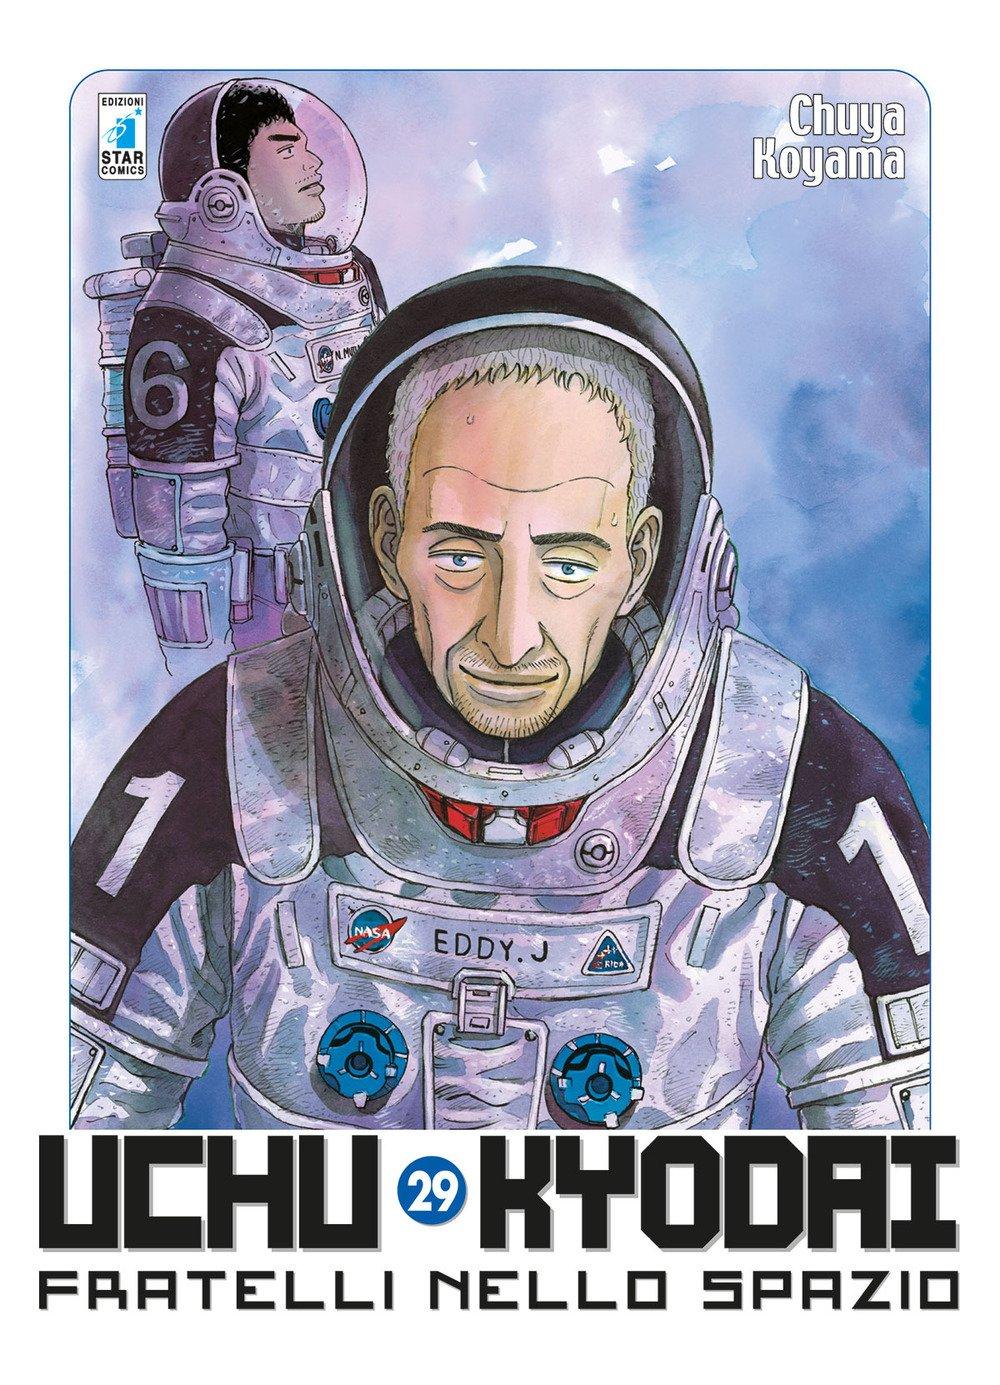 Uchu Kyodai. Fratelli nello spazio: 29 Copertina flessibile – 16 gen 2018 Chuya Koyama E. Cellie Star Comics 8822608380